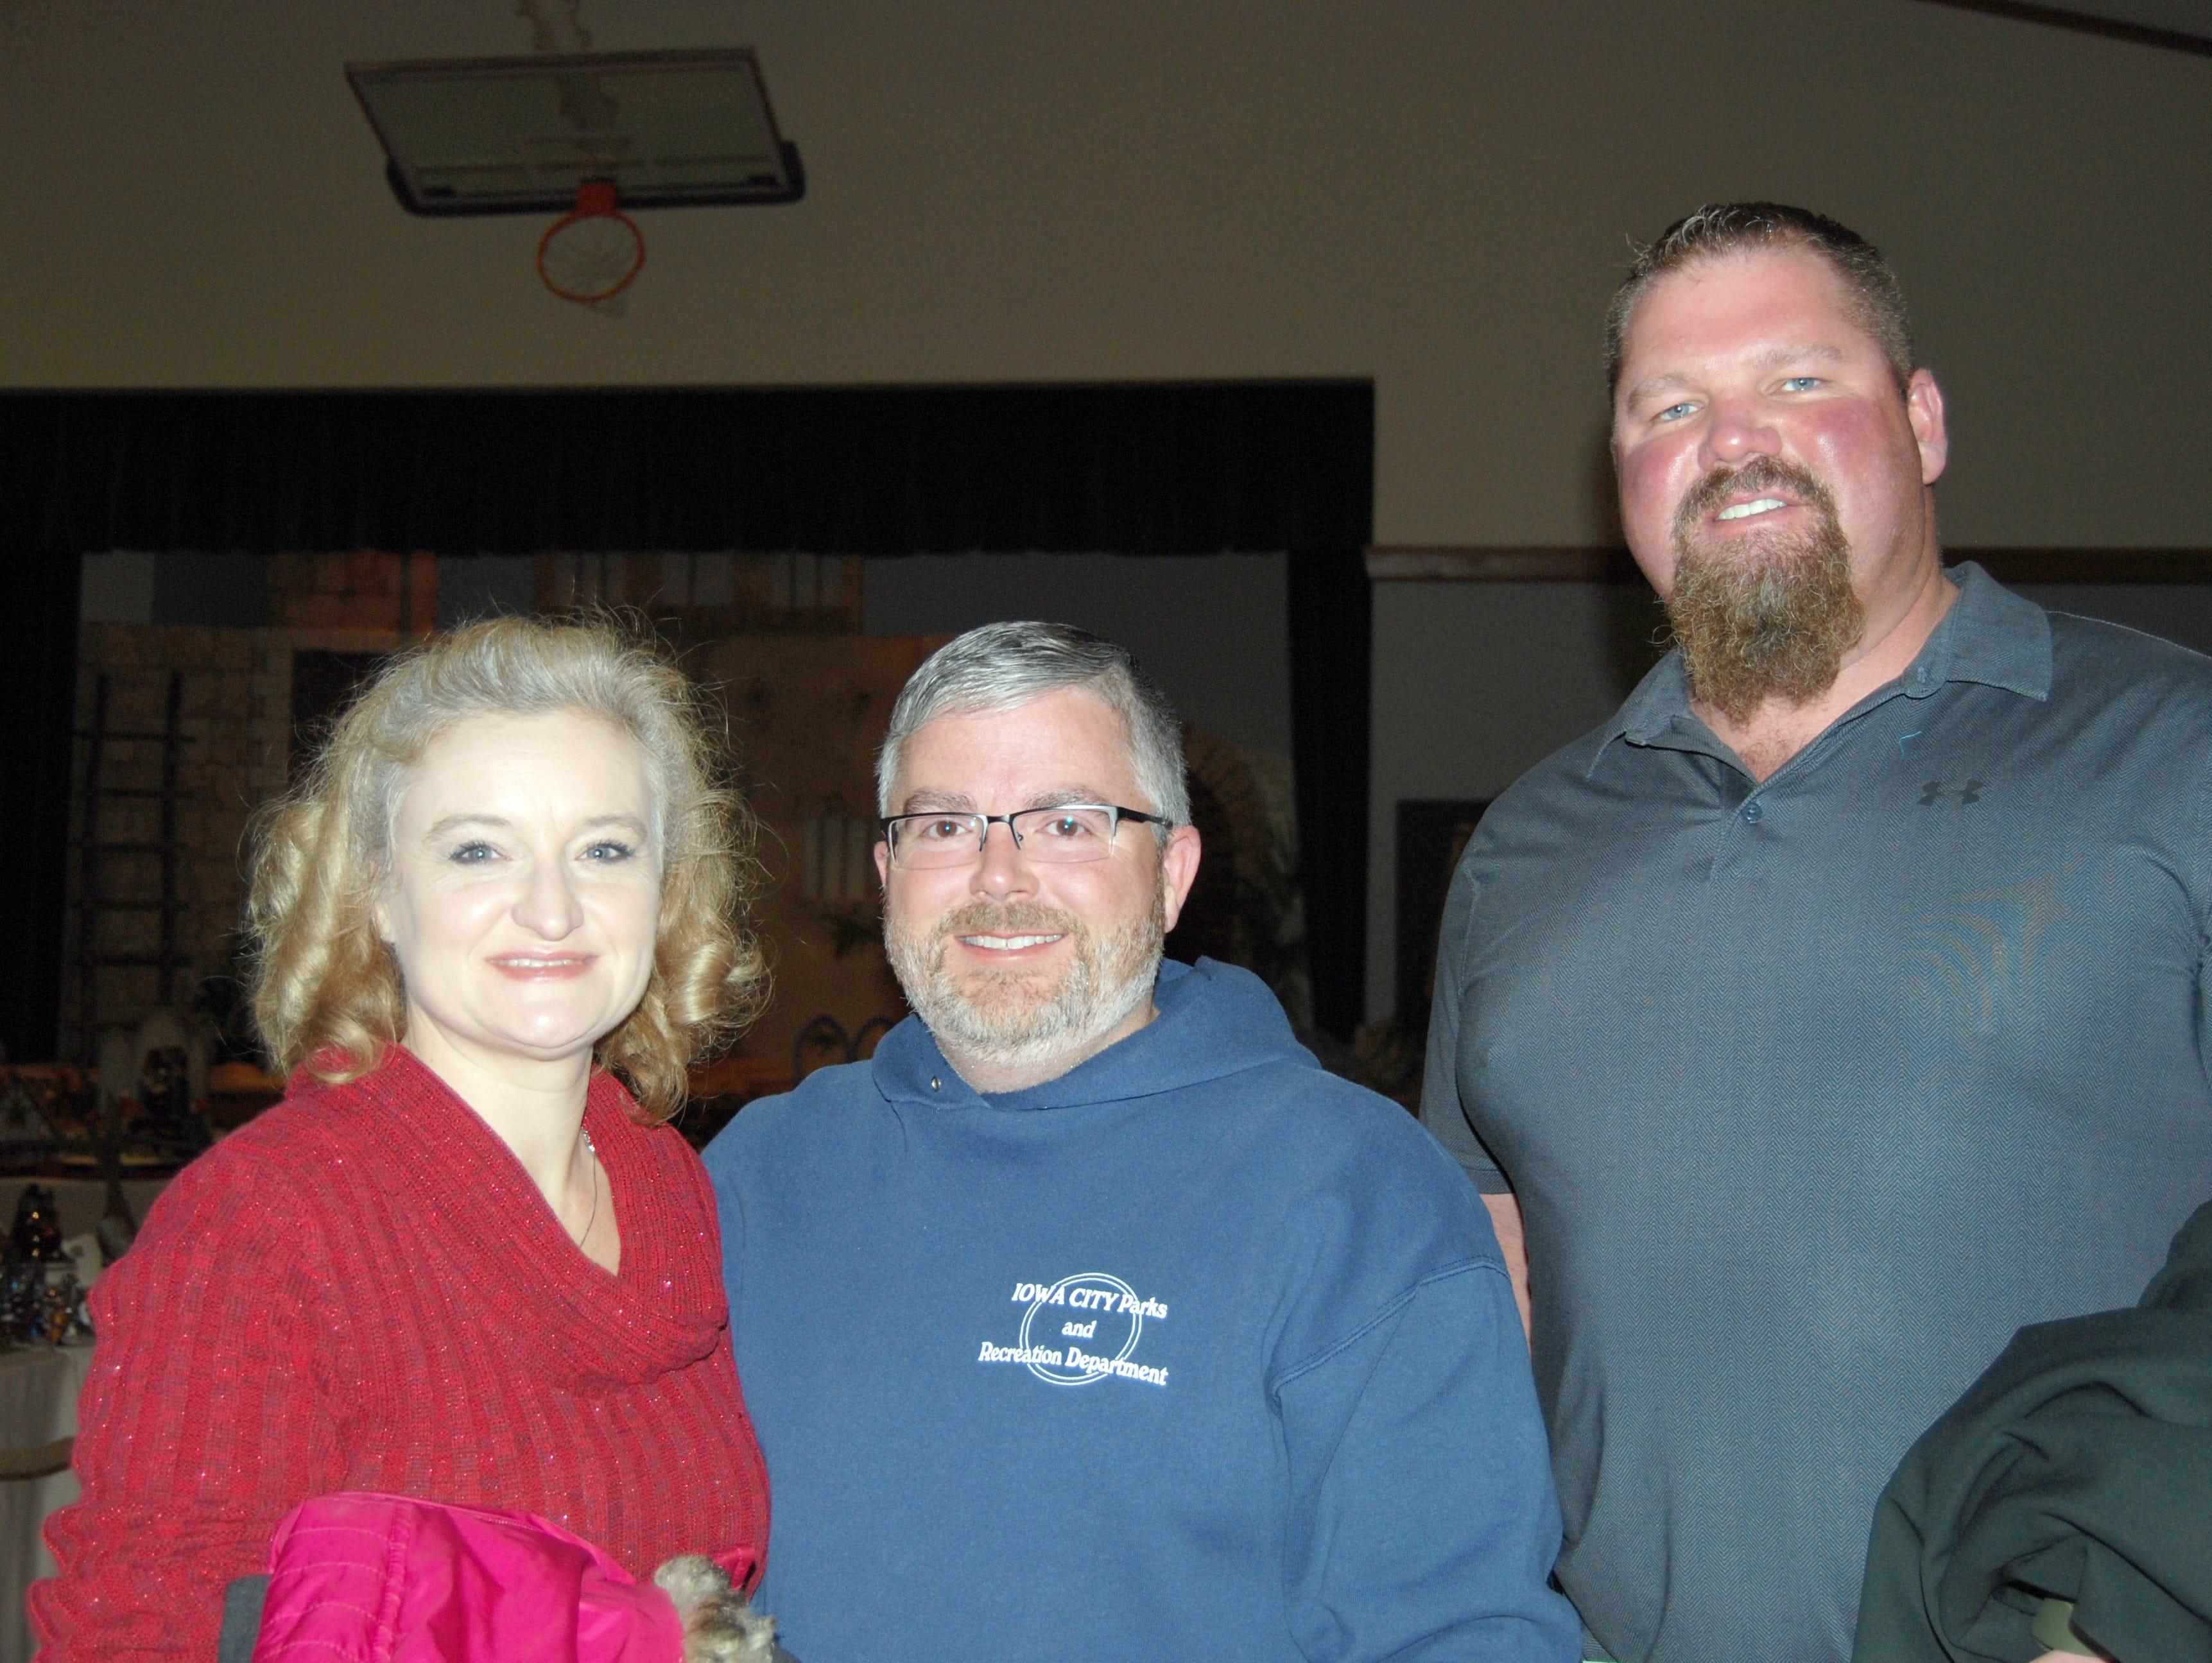 Dawn and Scott Gibbins and Phil Holman